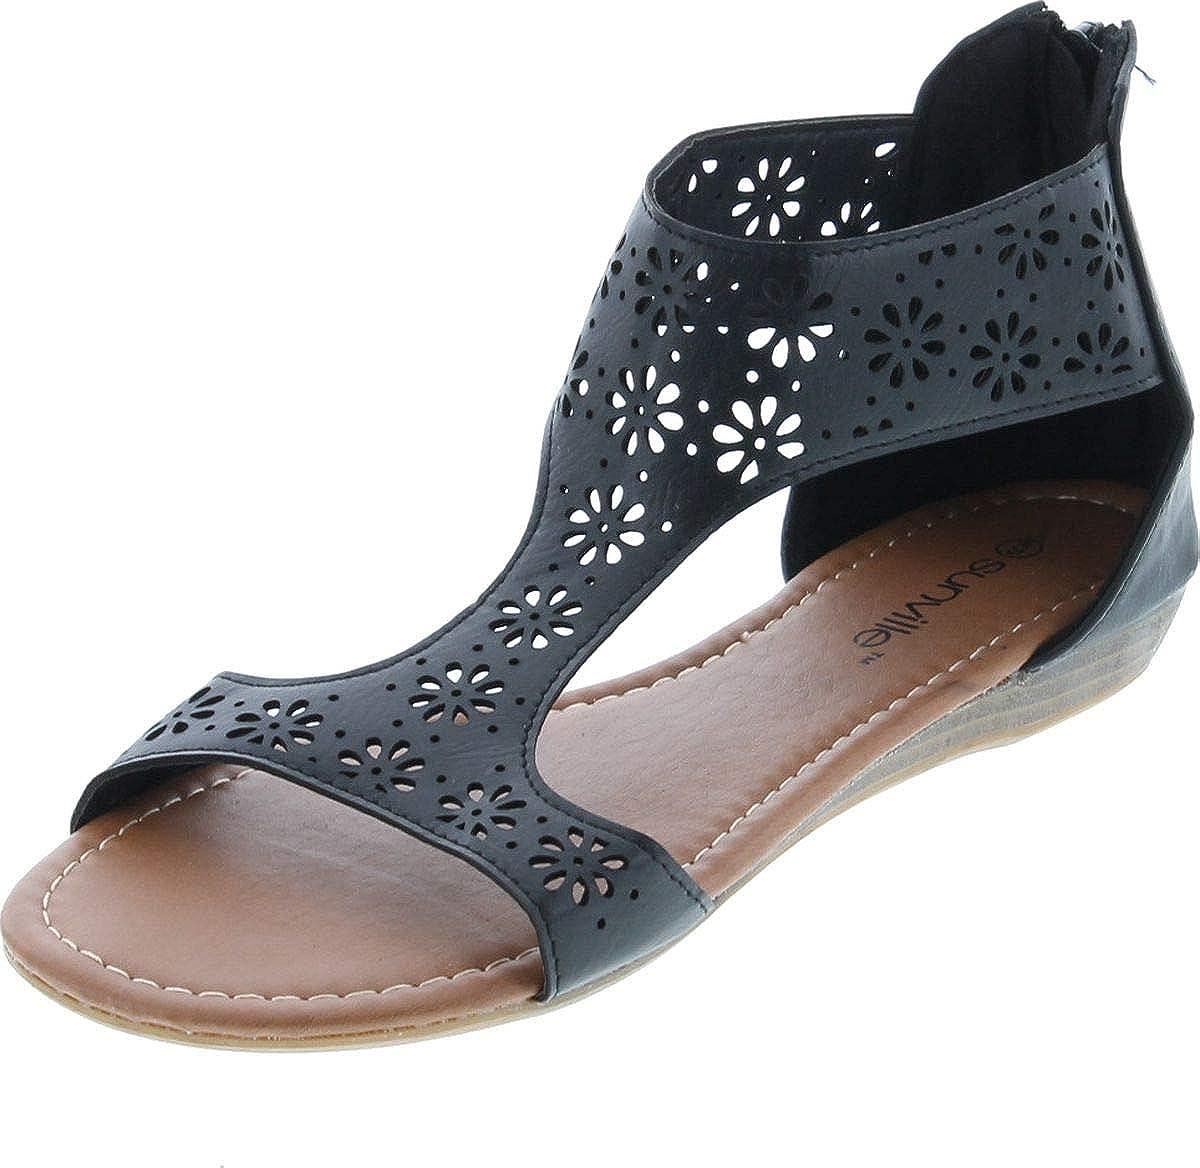 Sunville Womens Gladiator Fashion Sandals